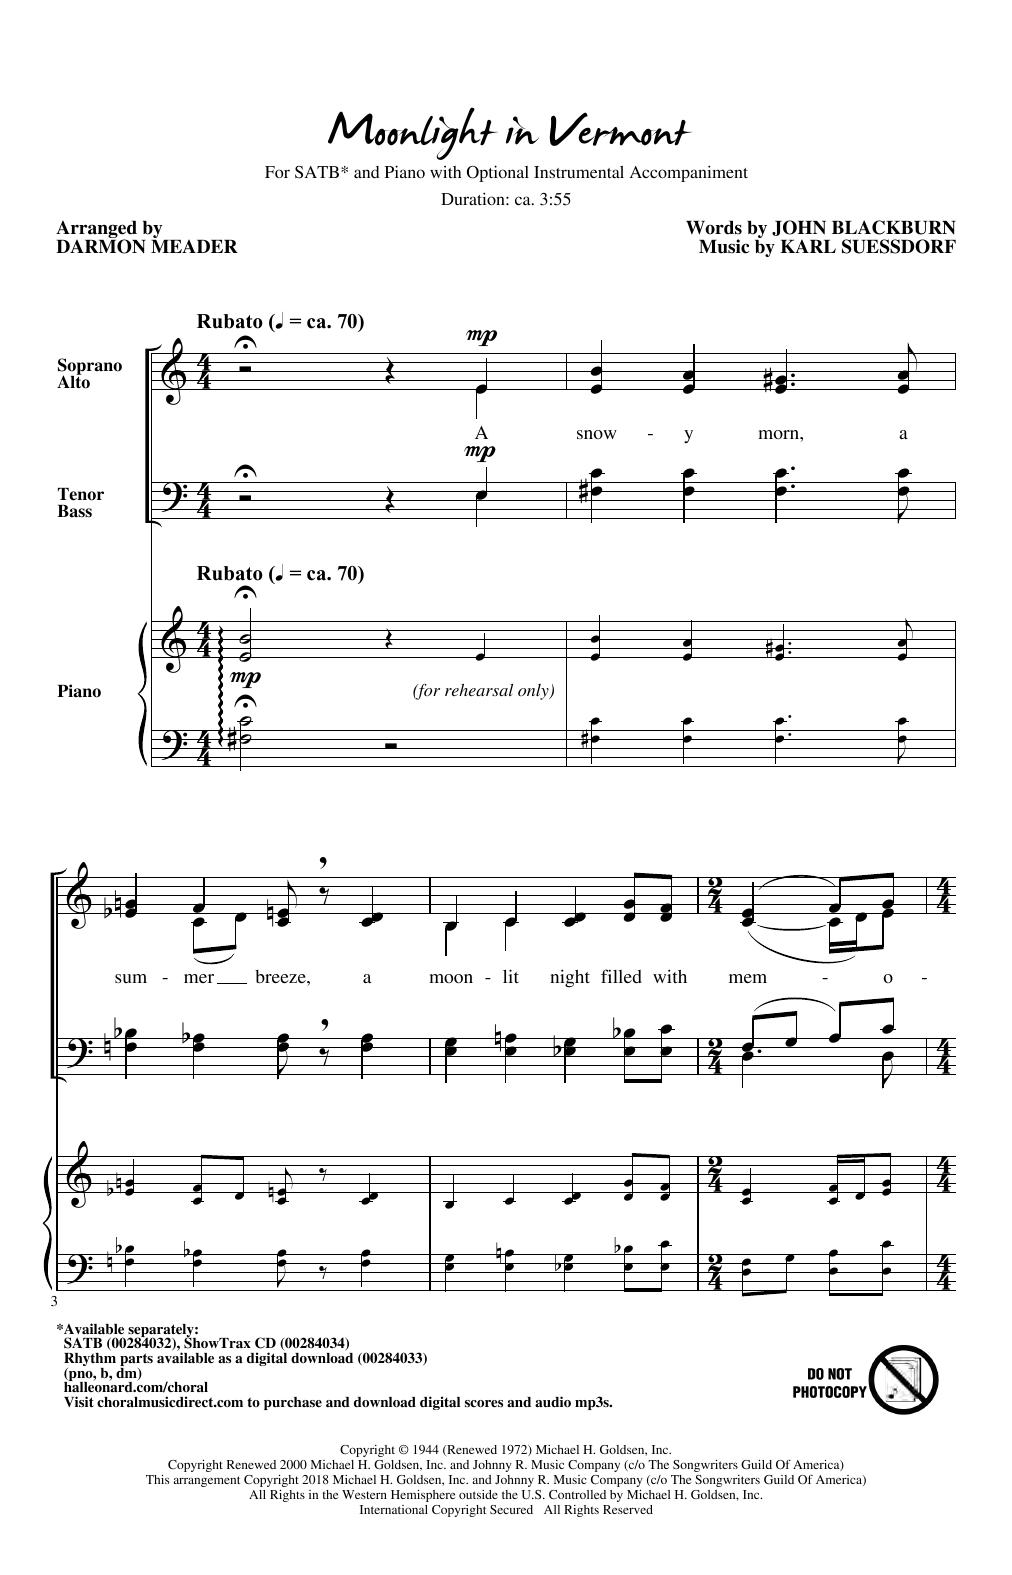 Moonlight in Vermont (arr. Darmon Meader) (SATB Choir)